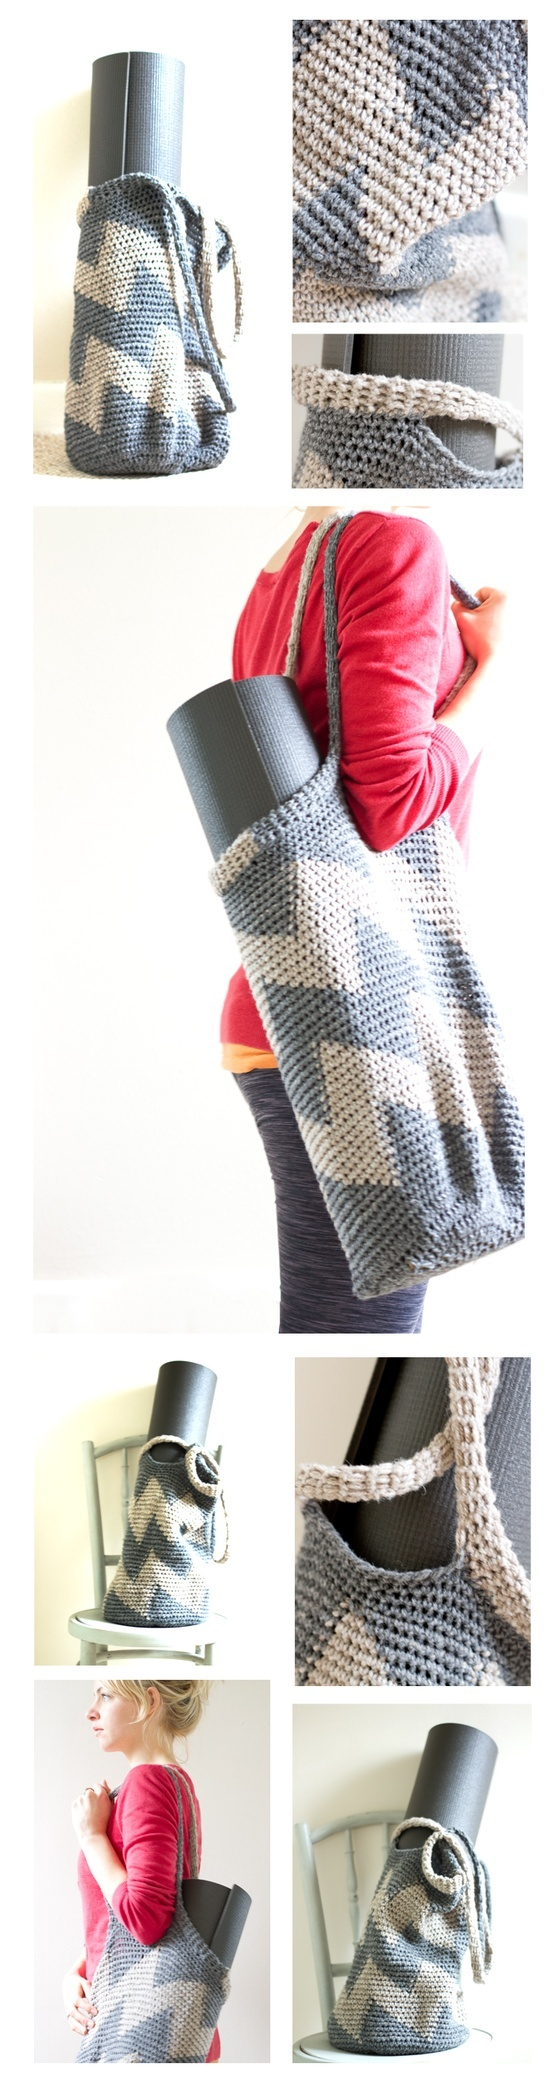 Crochet Yoga Patterns : crochet patterns